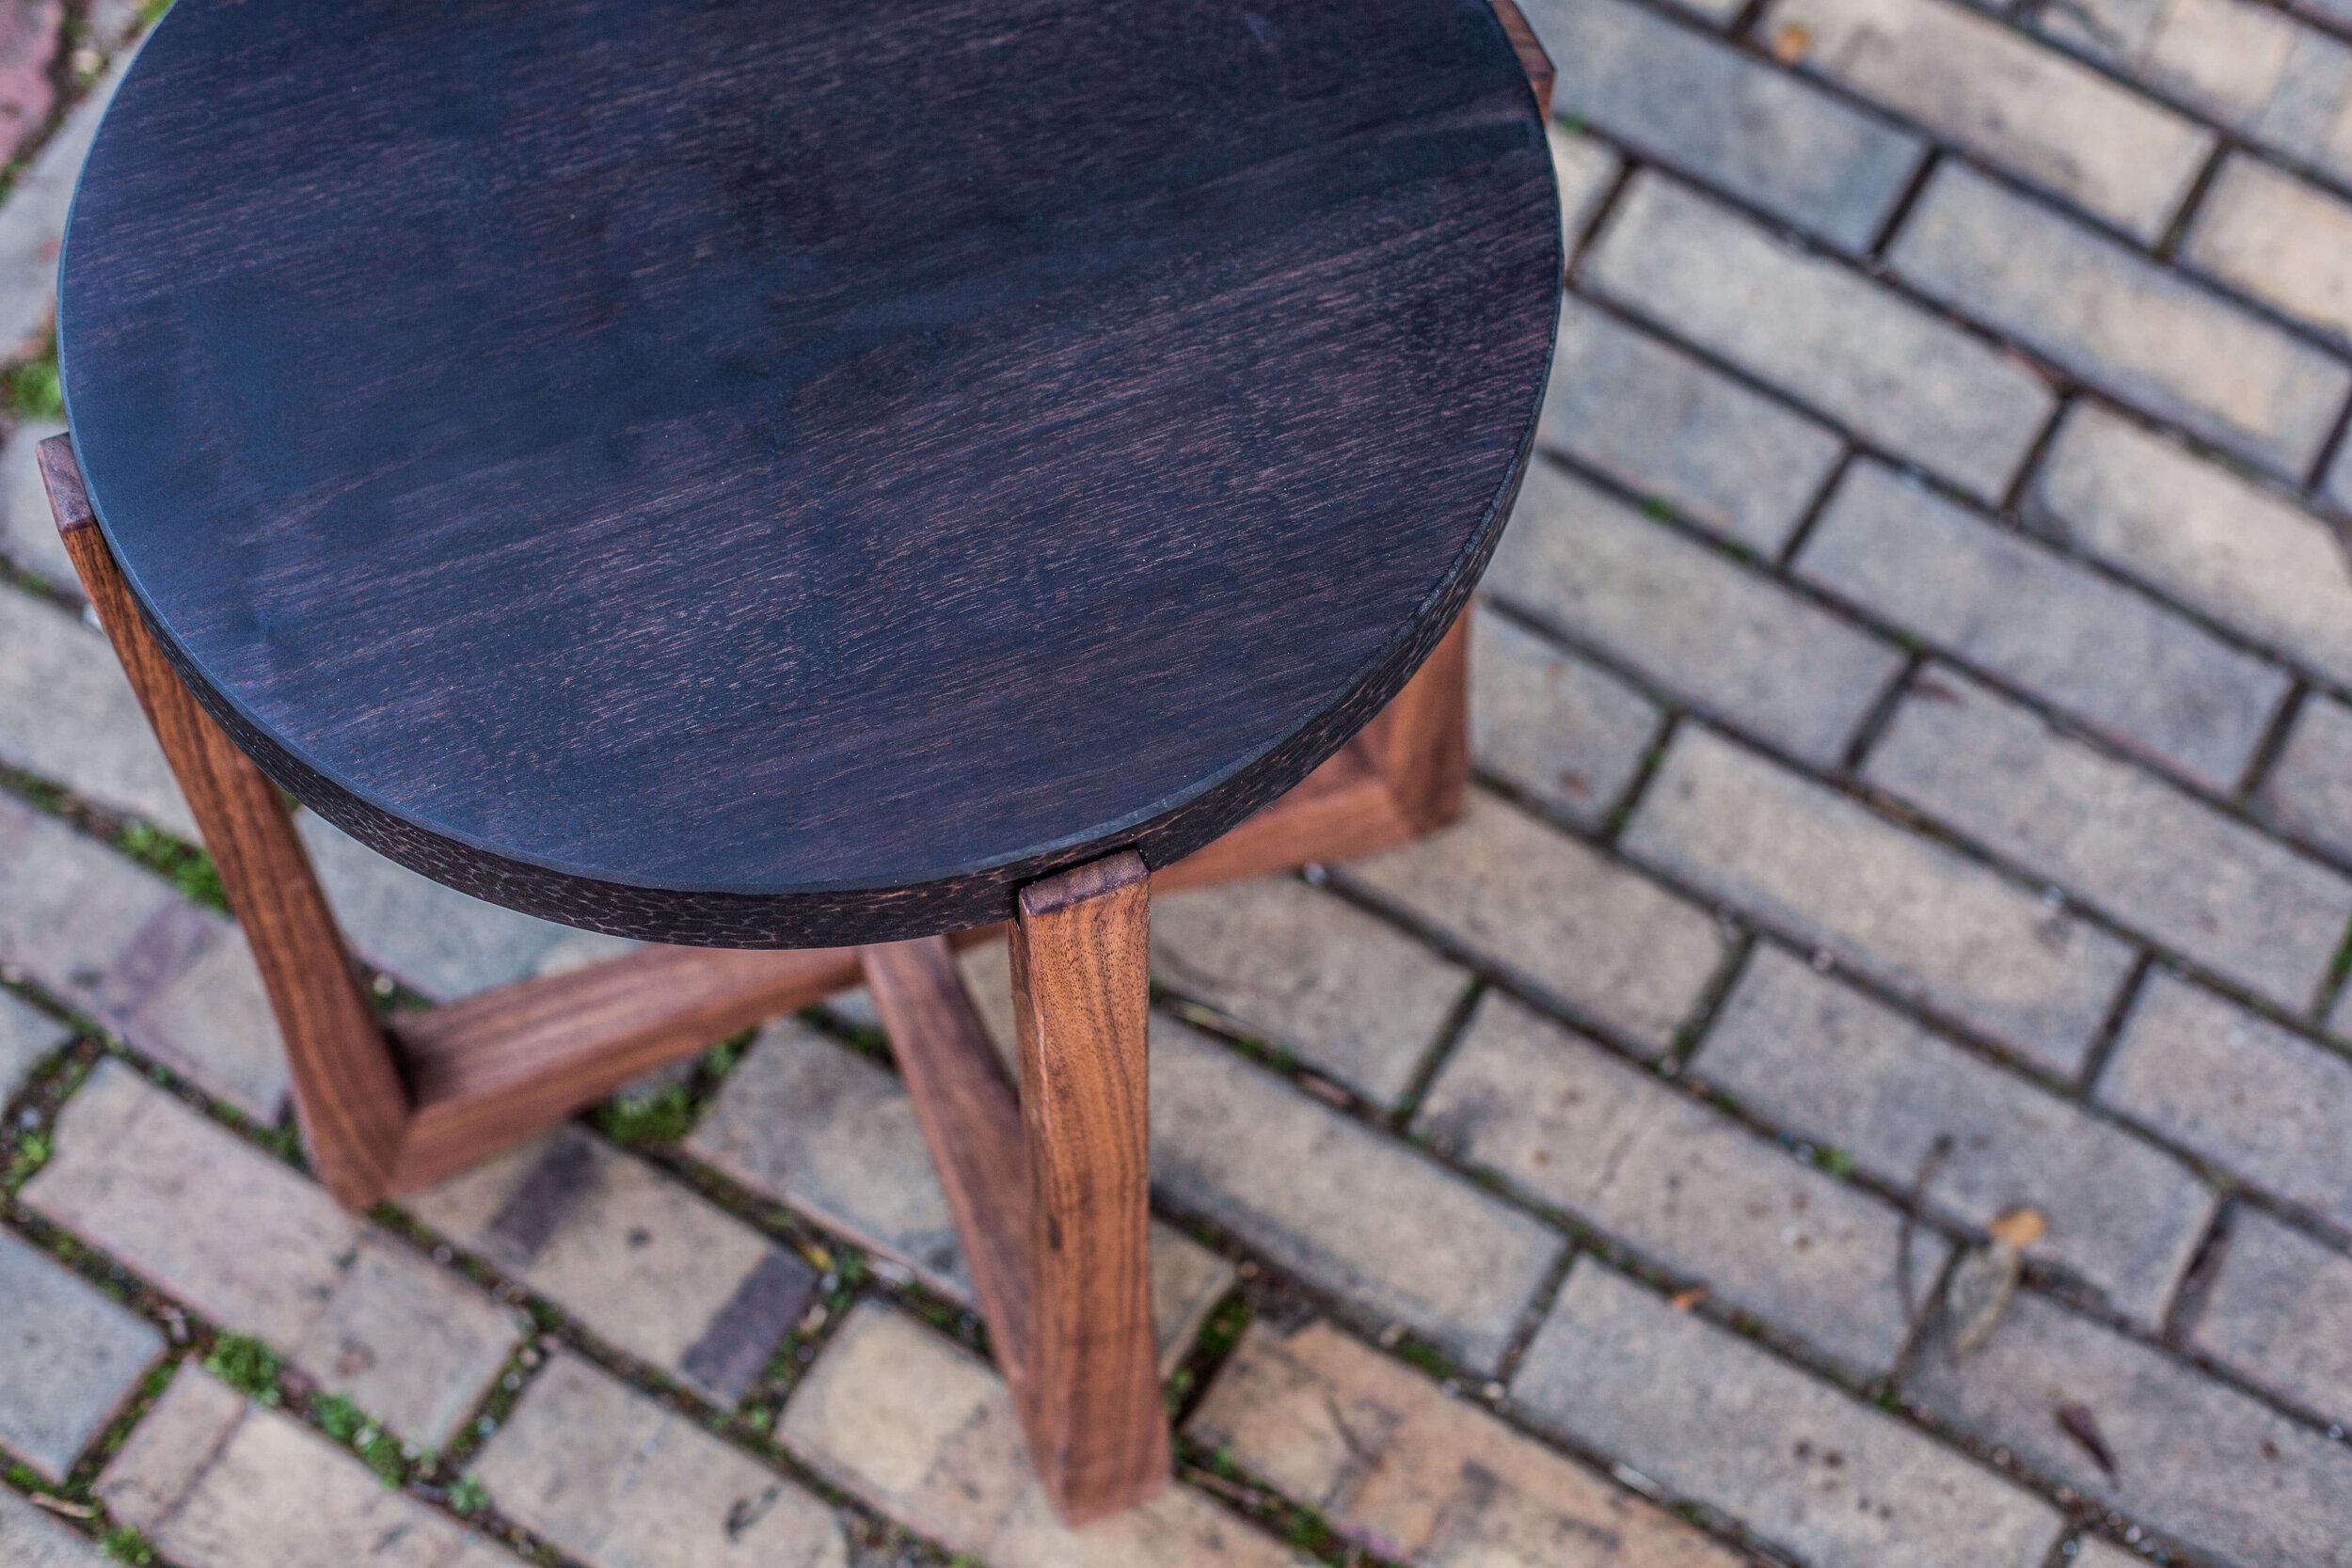 Alicia_Dietz_Modern_Concrete_Furniture_Carved_Wood_End_Table_Sofa_Table_Richmond_VA_5